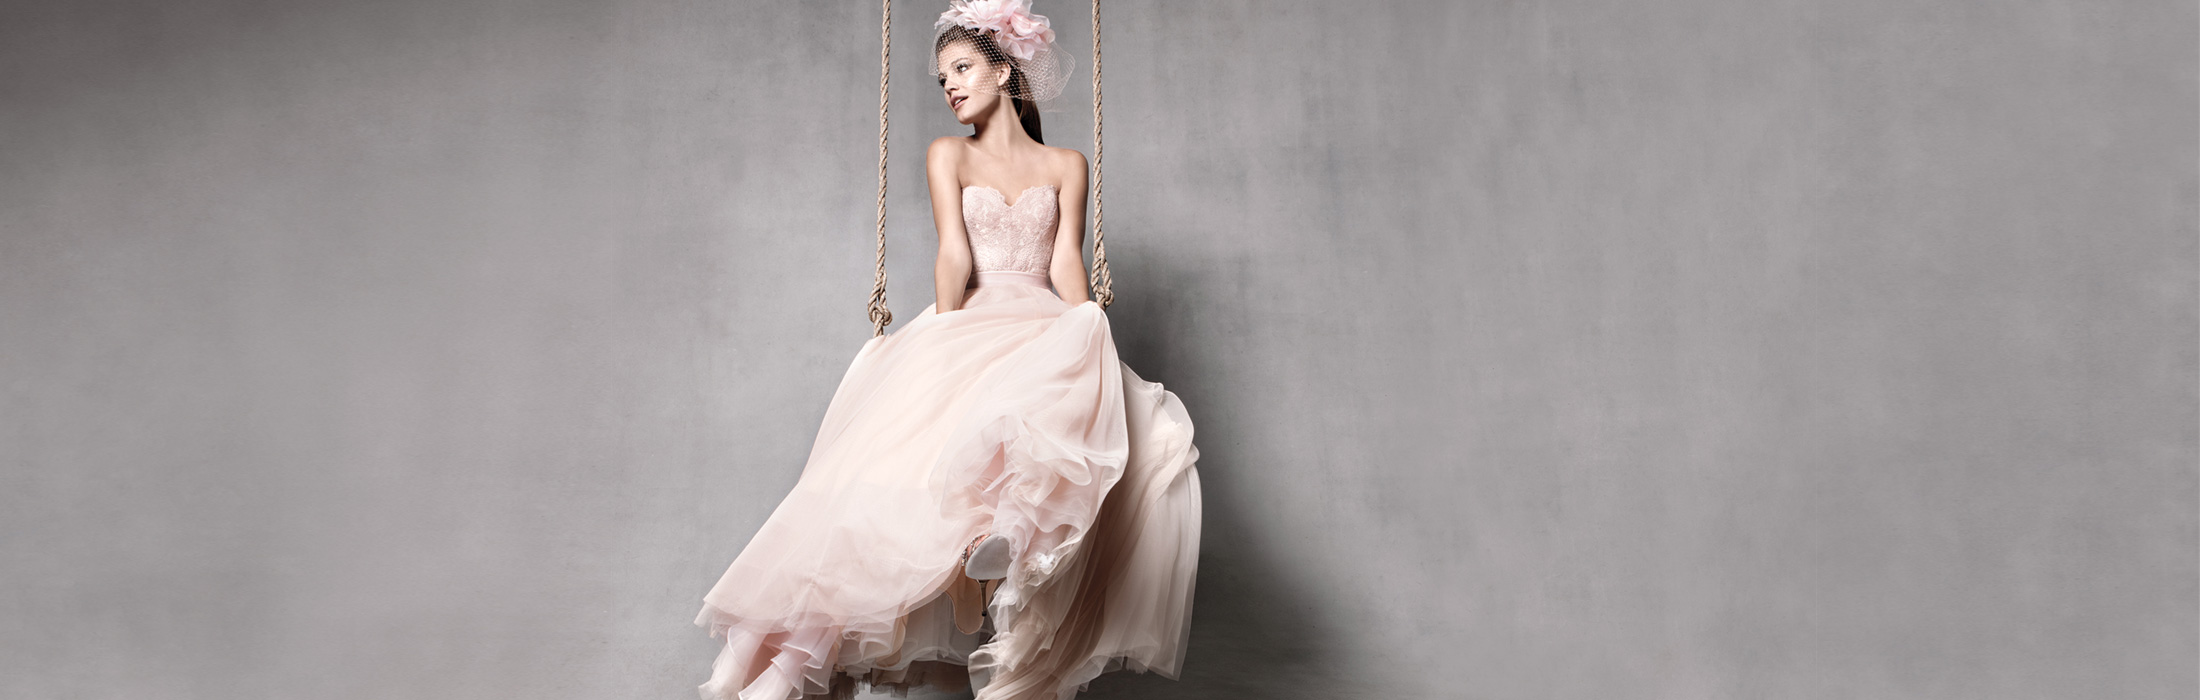 Bride Couture Bridal Services 84